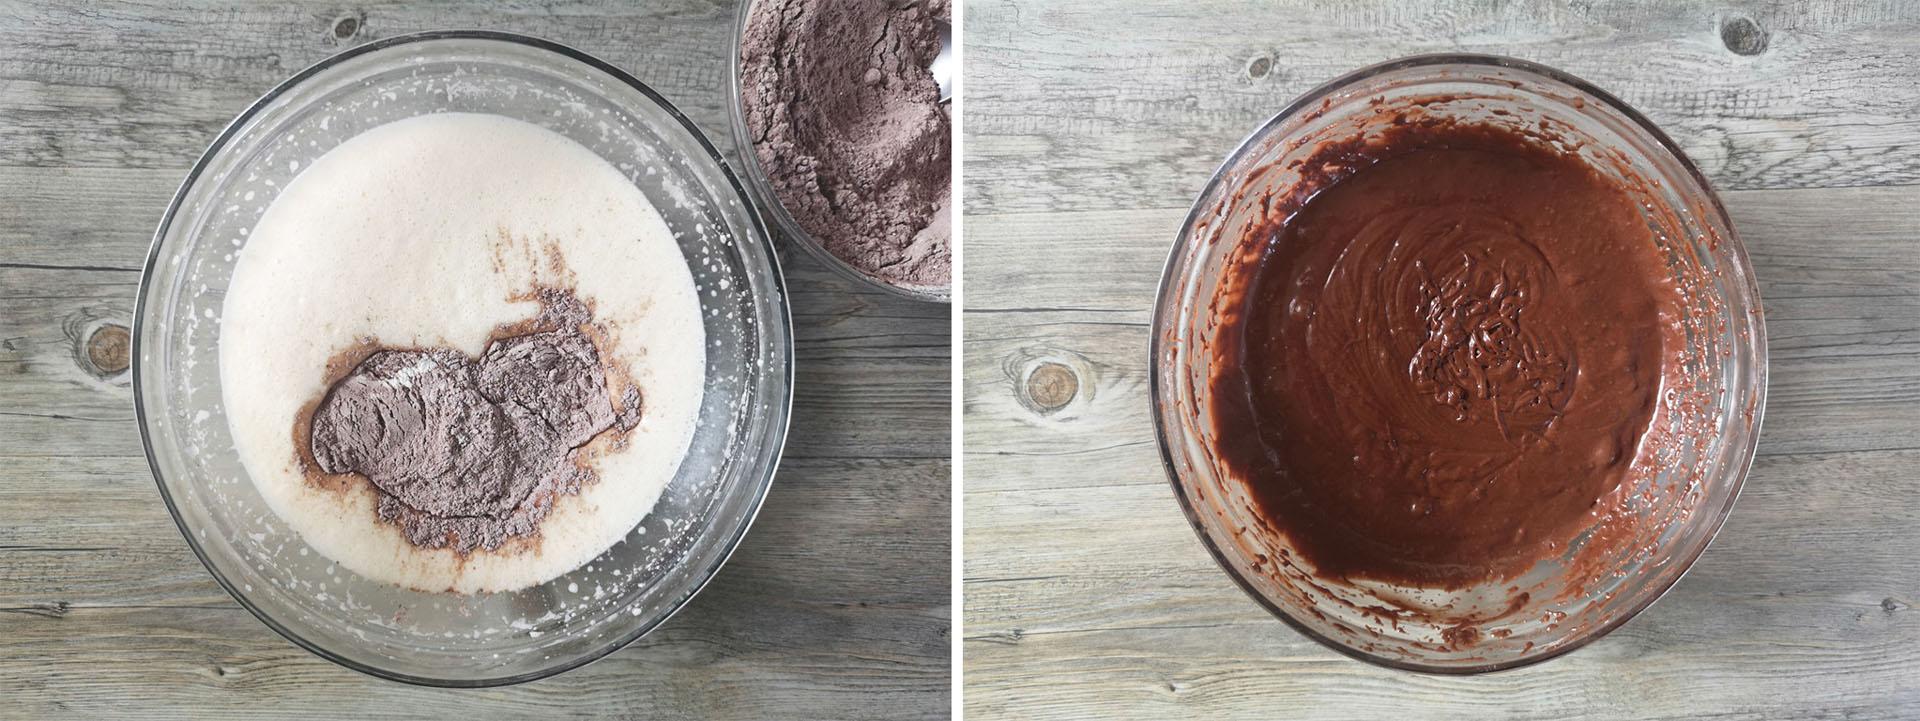 plumcake pere cioccolato con cacao